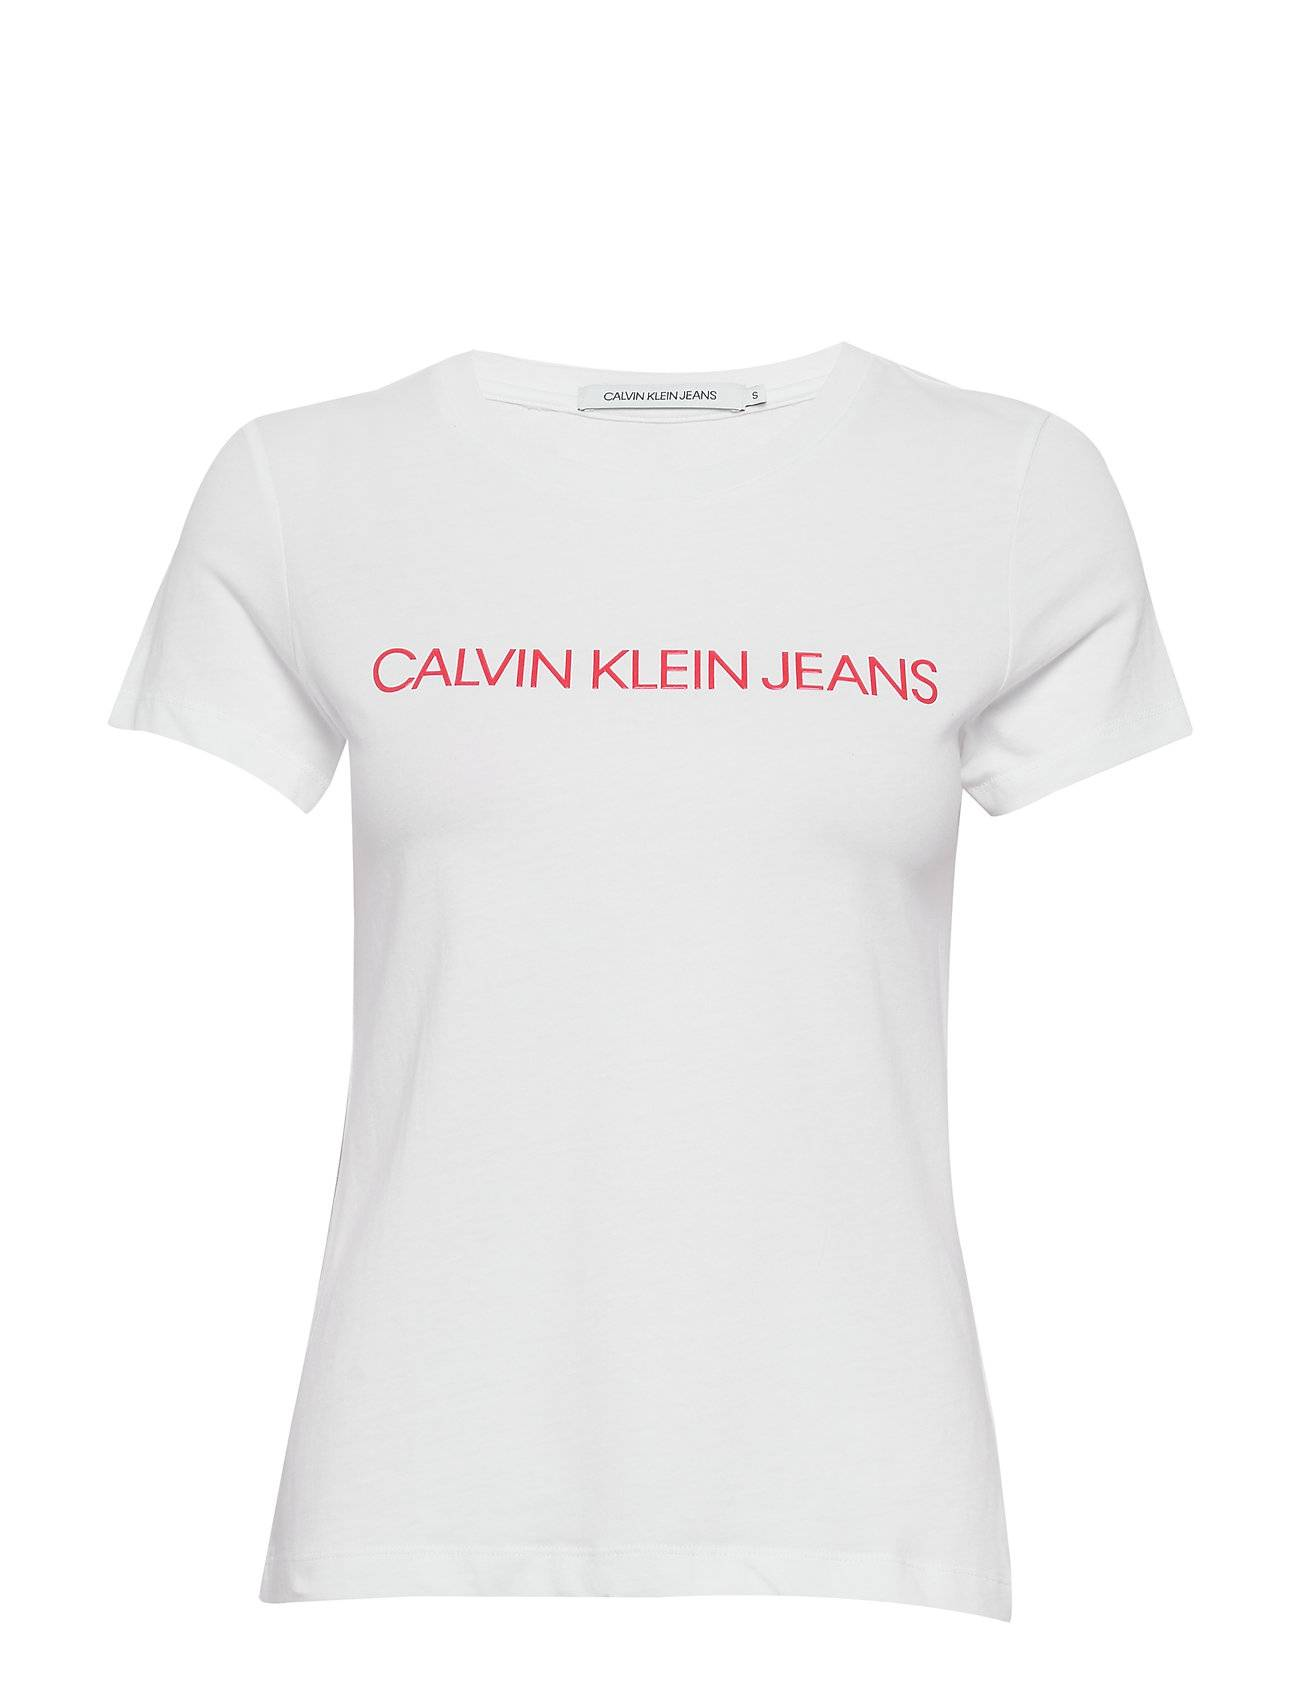 Image of Calvin Institutional Logo Slim Fit Tee T-shirts & Tops Short-sleeved Valkoinen Calvin Klein Jeans